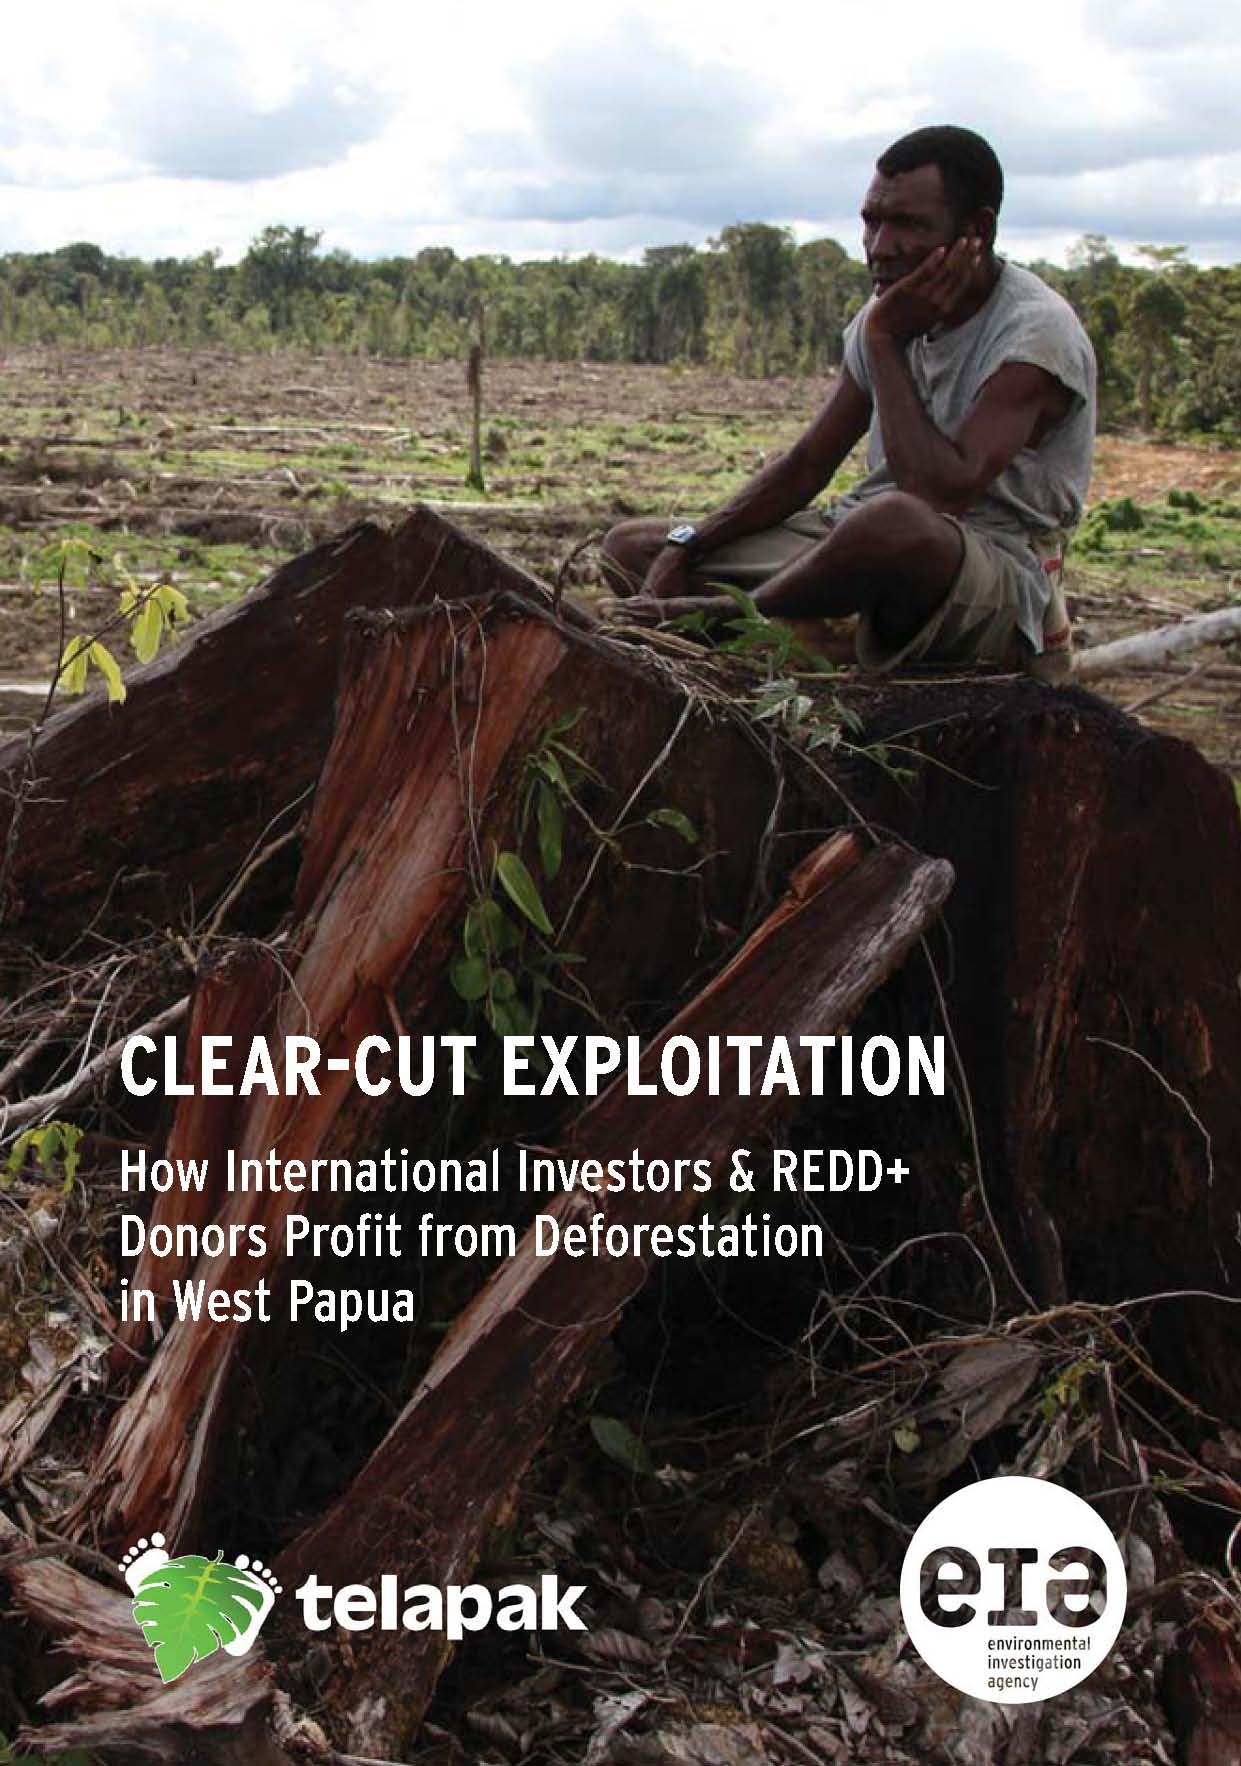 west papua a history of exploitation essay